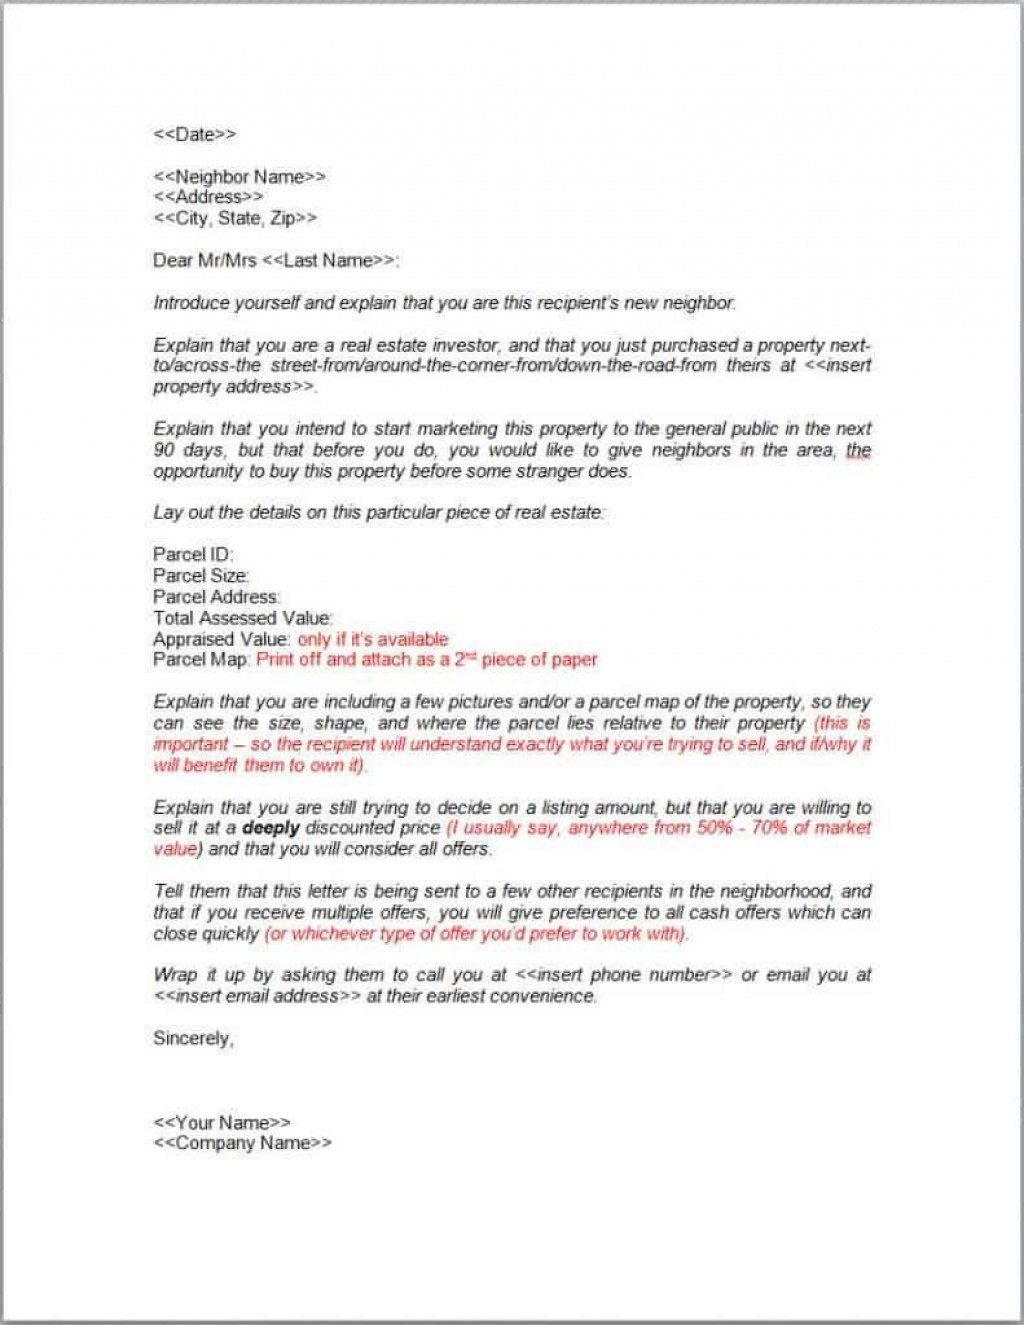 003 Dreaded Real Estate Marketing Letter Template High Definition  TemplatesLarge